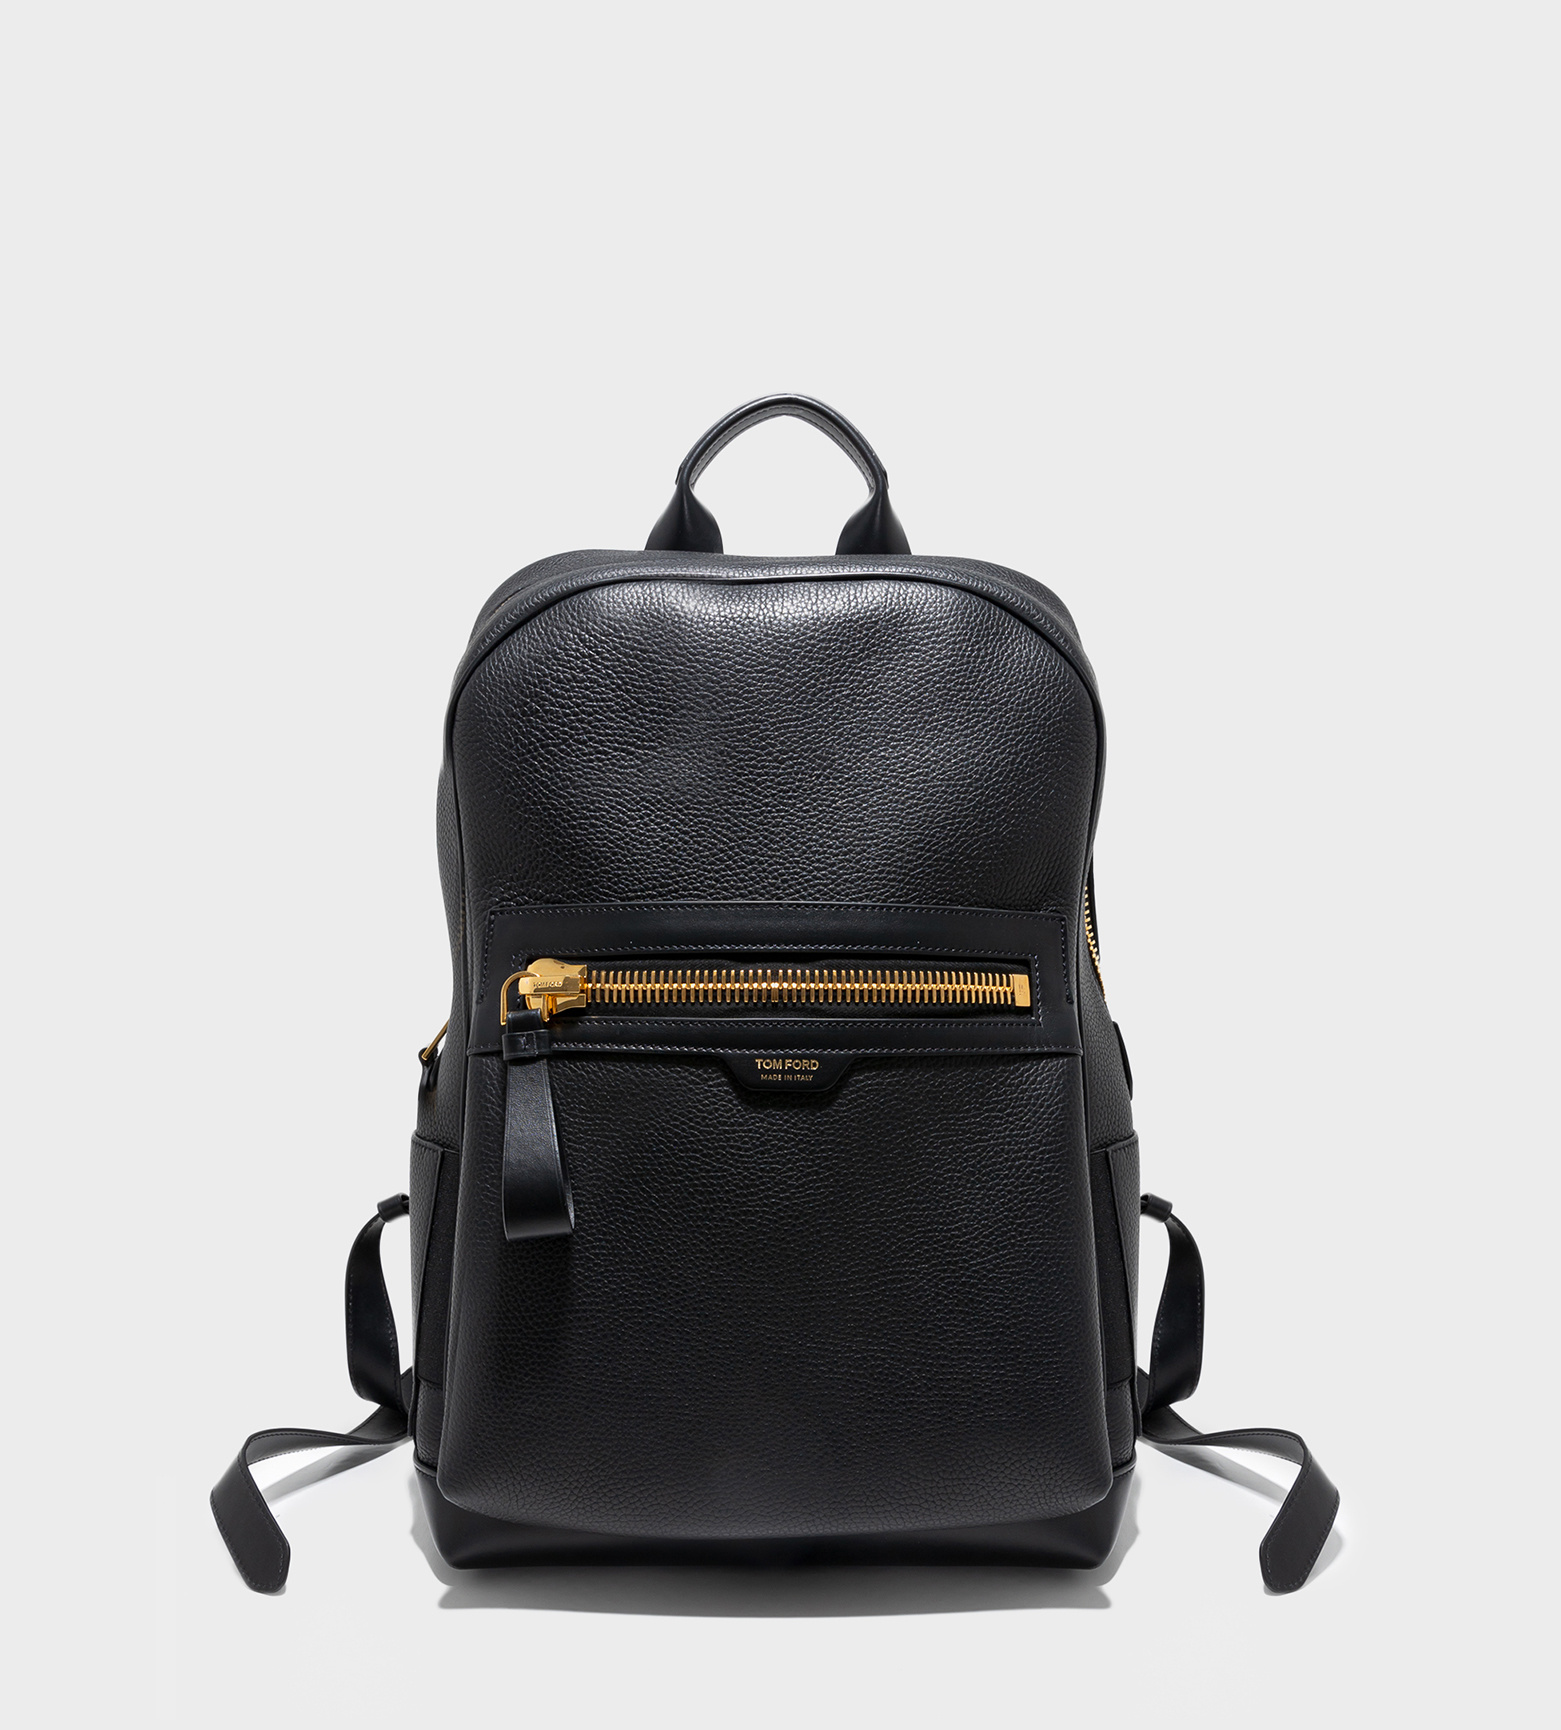 TOM FORD Calfs Leather Backpack Black